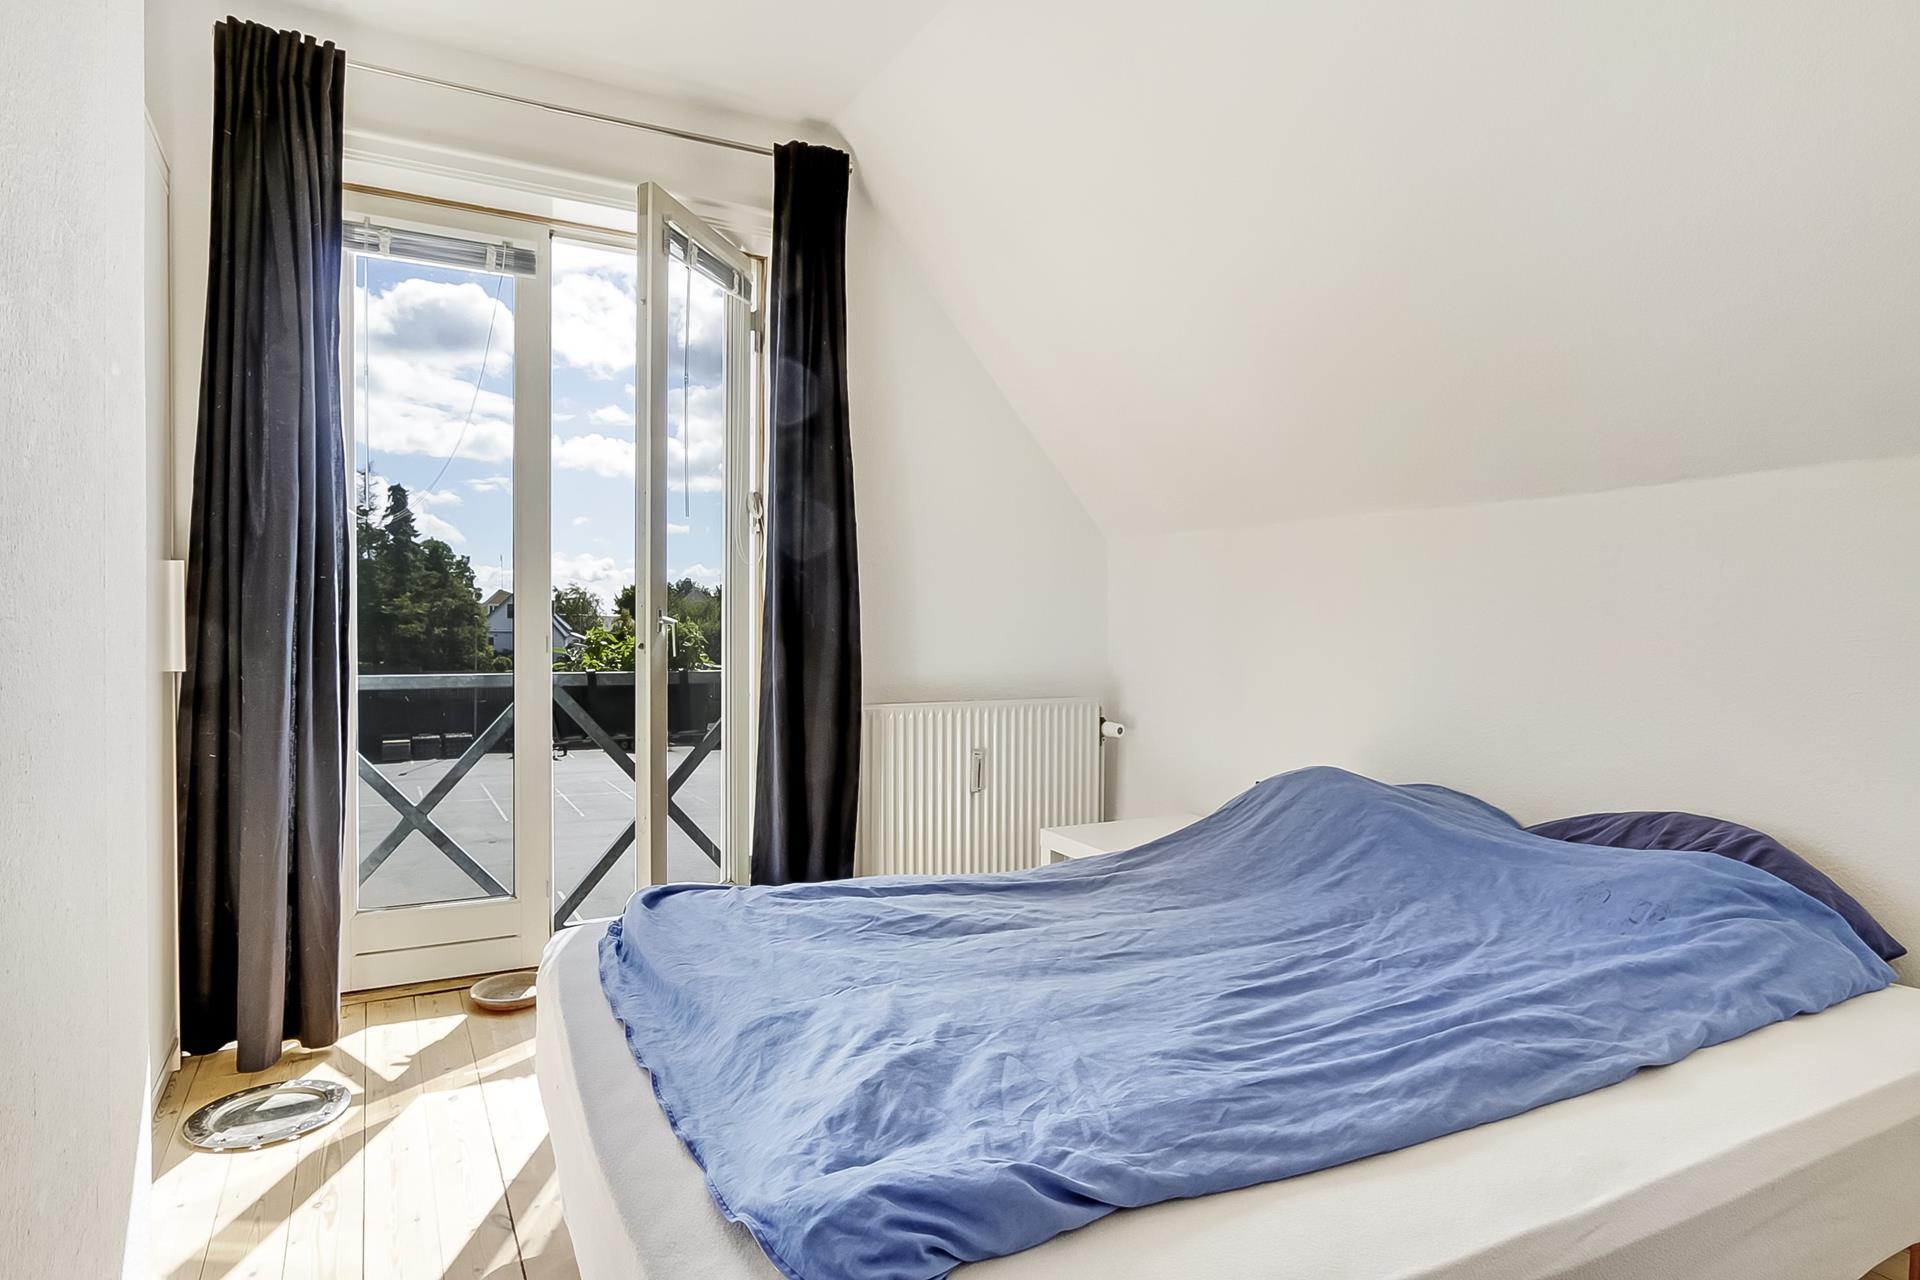 Bolig/erhverv på Mølmarksvej i Svendborg - Soveværelse